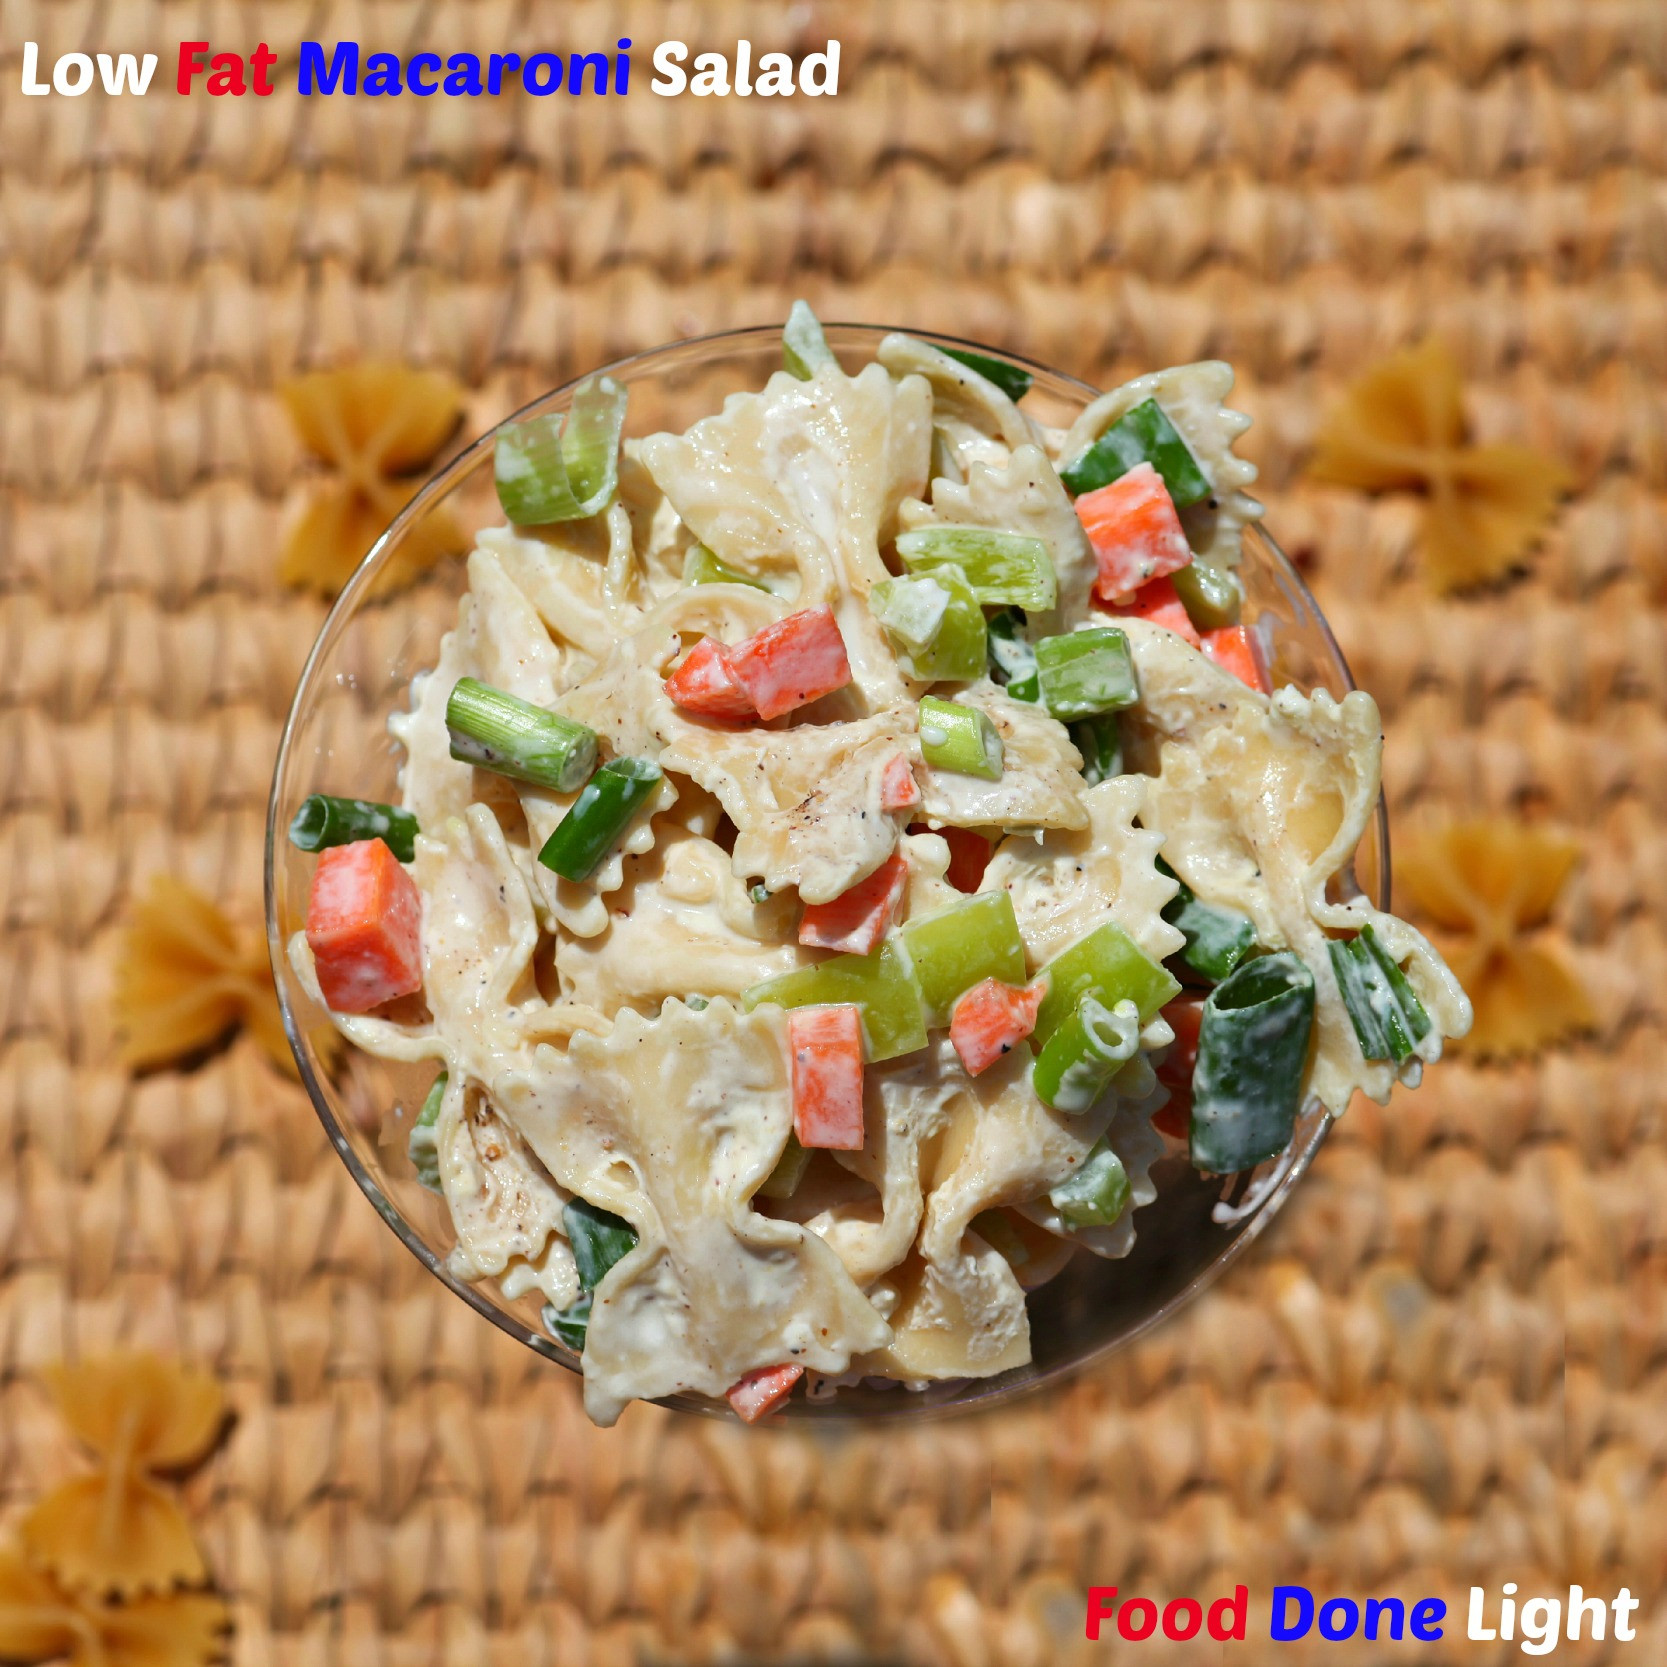 Low Fat Pasta Salad  Low Fat Macaroni Salad